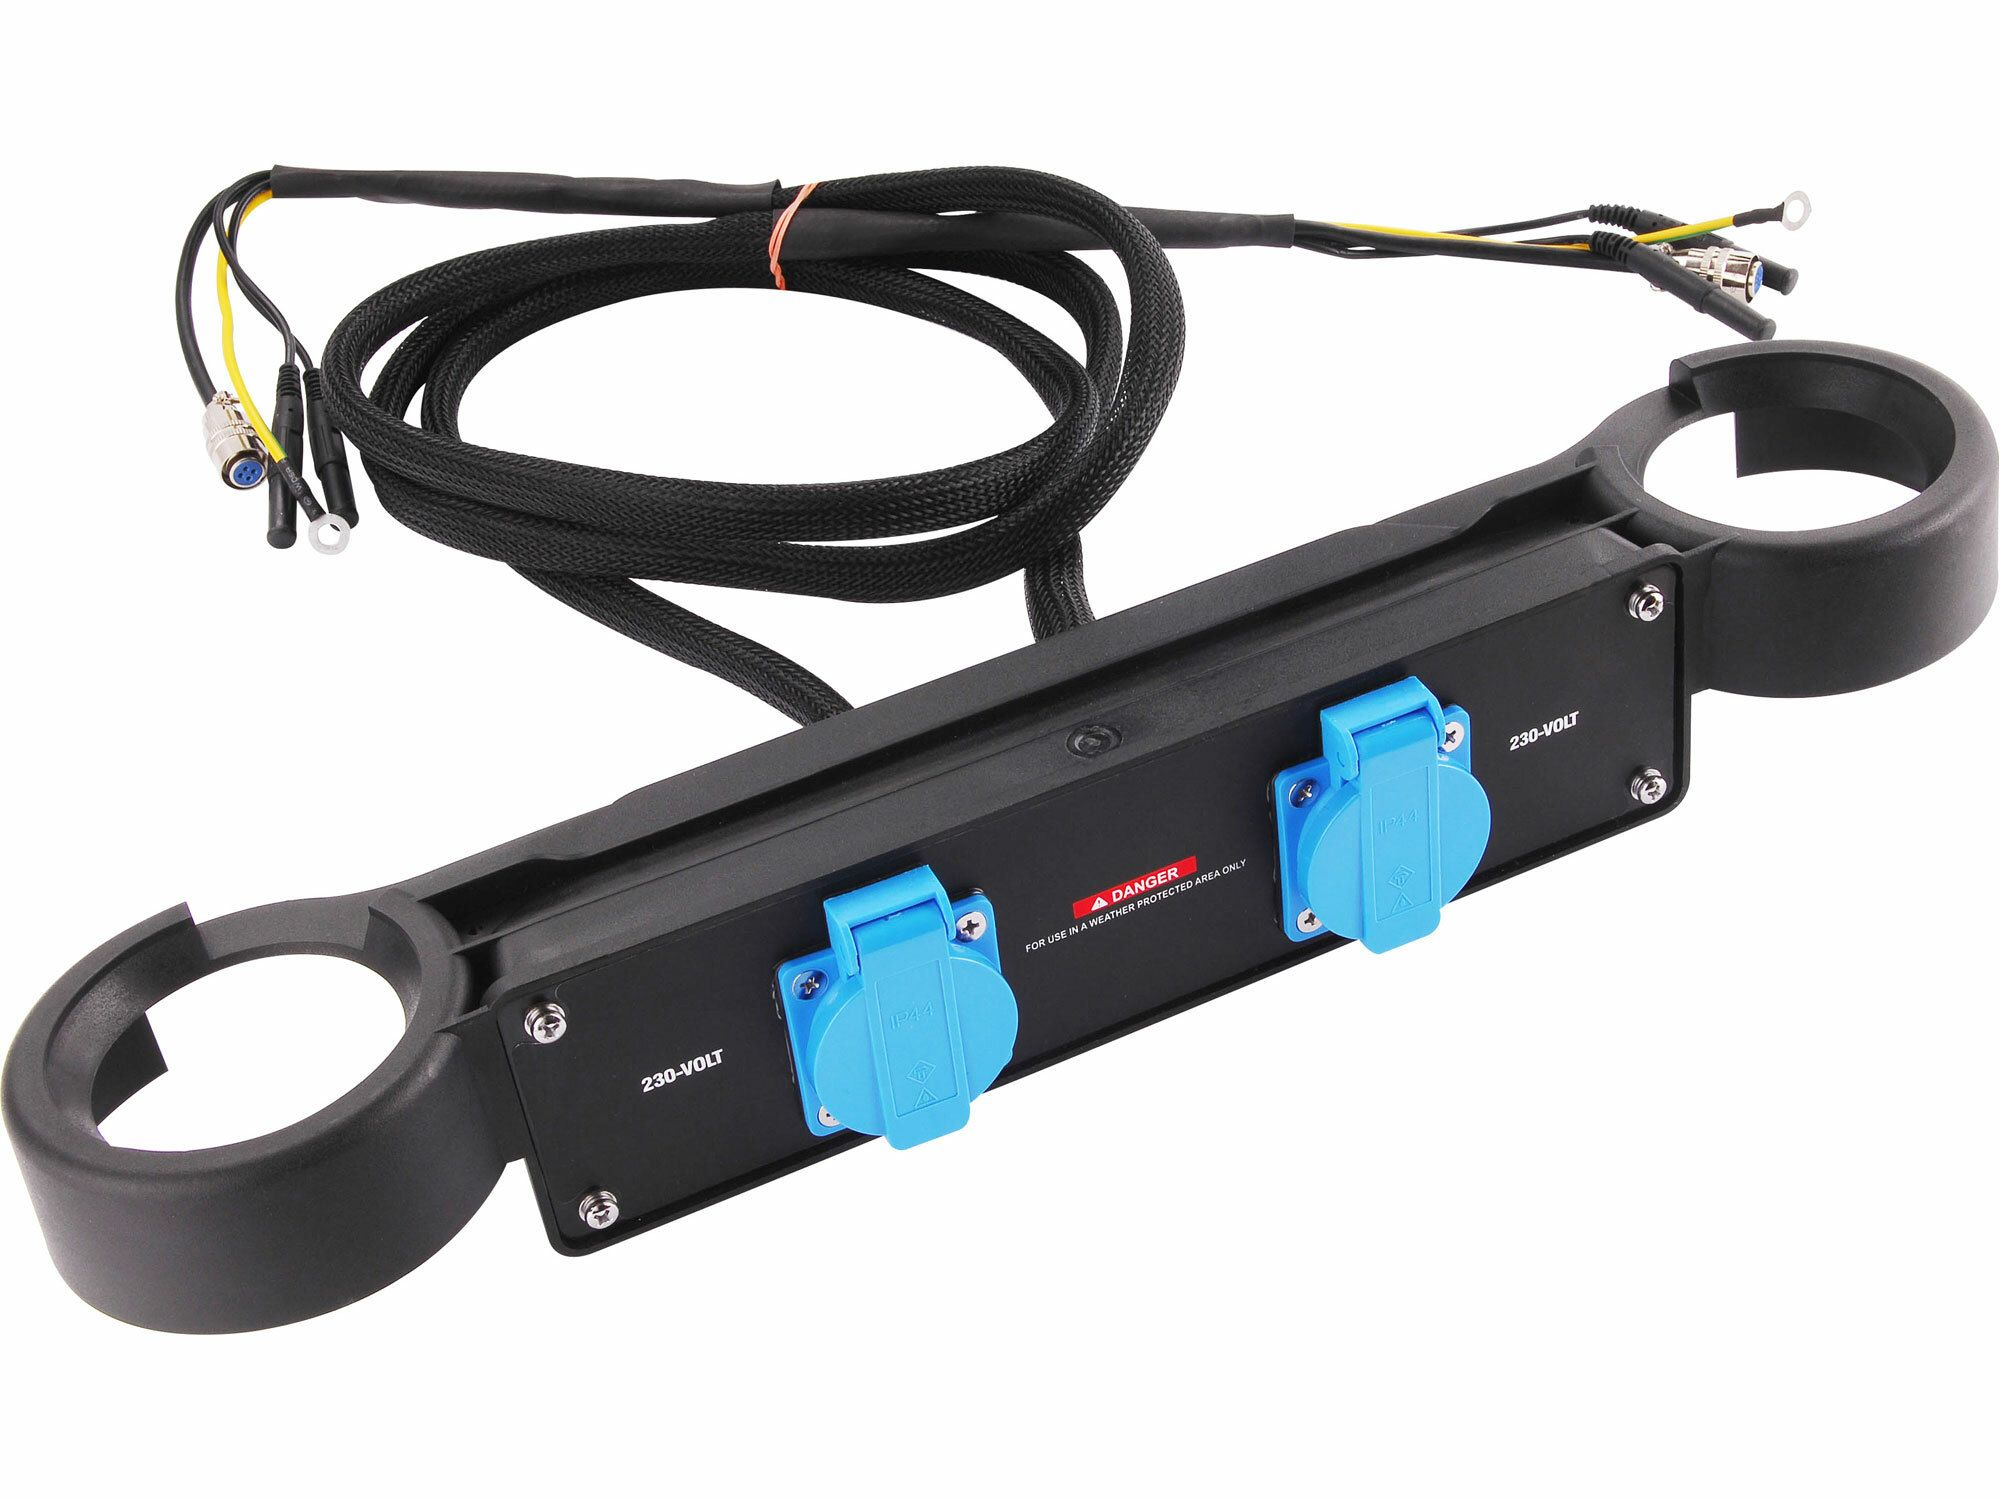 Propojovací kabel 2kW, Heron, 8896217P